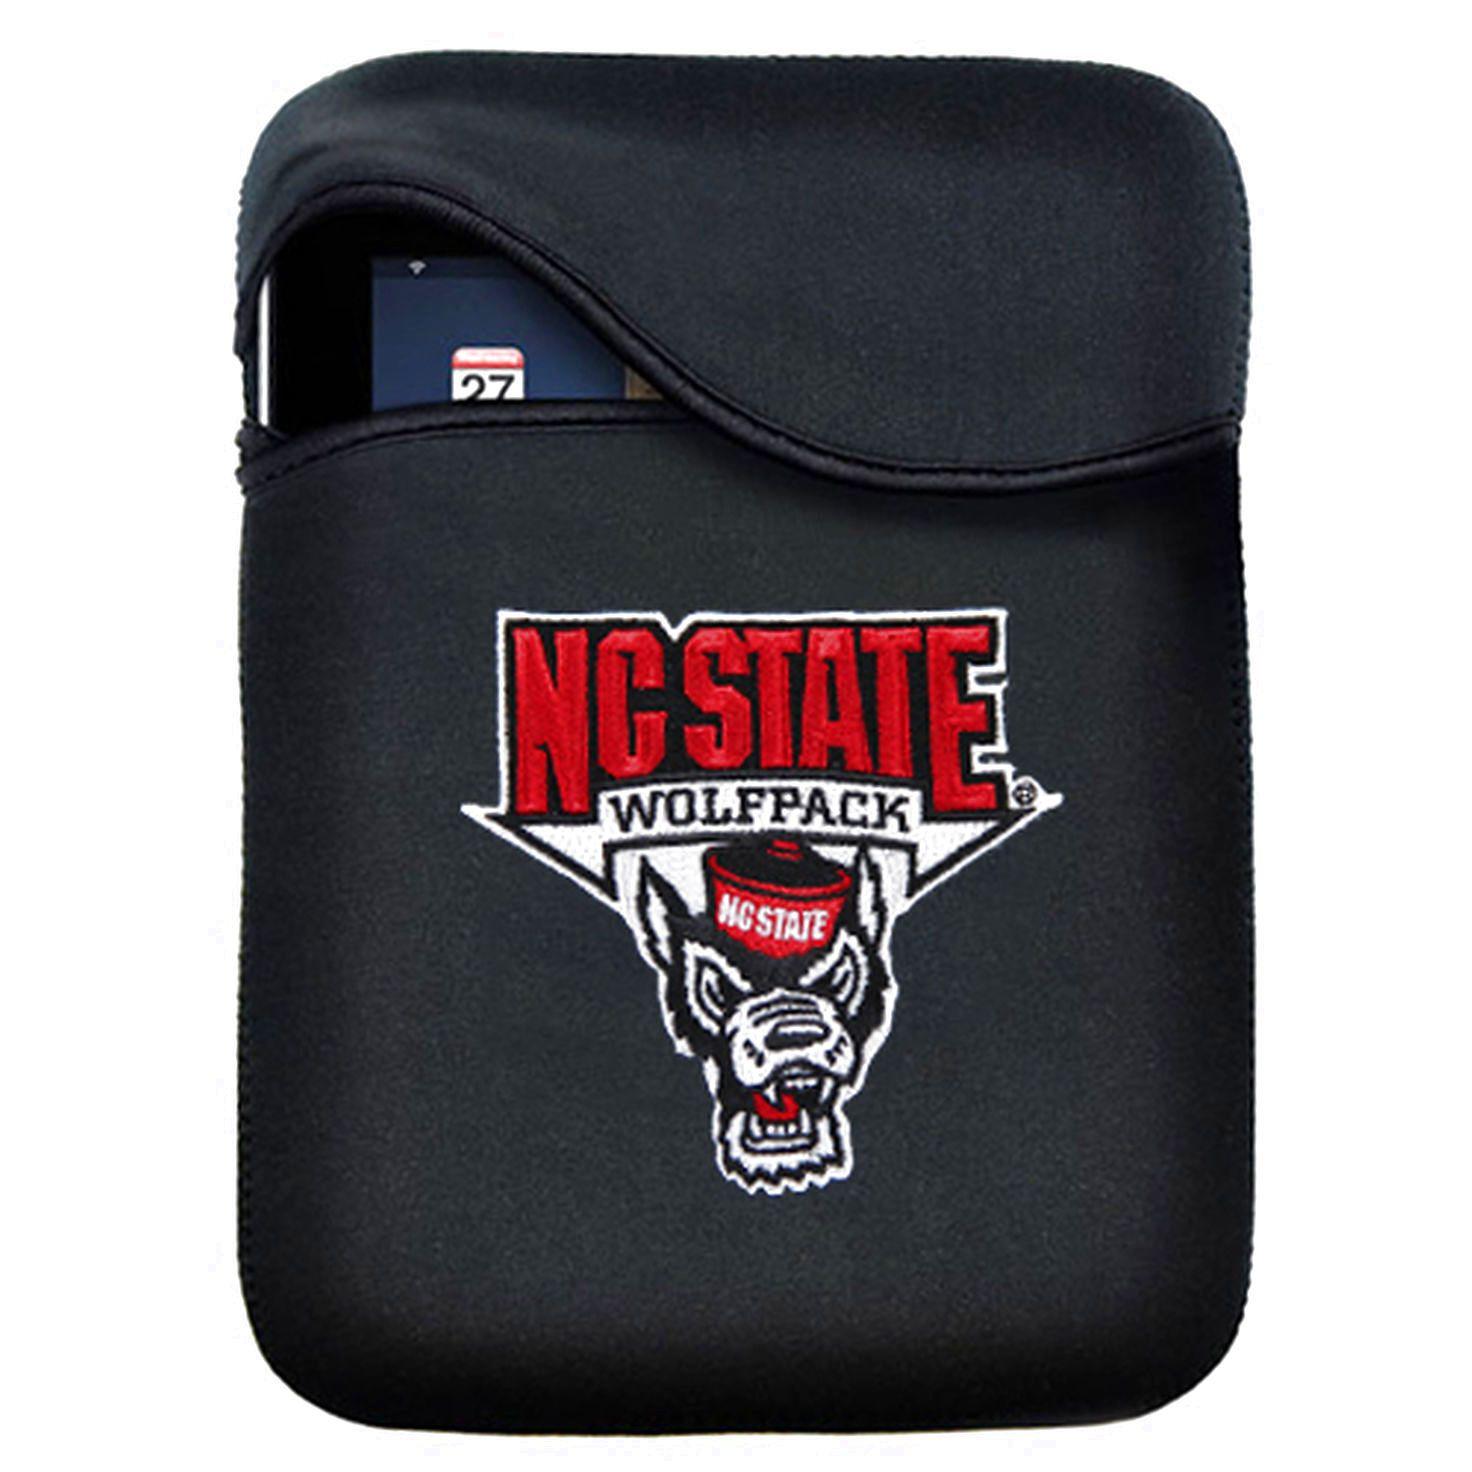 North Carolina State Wolfpack iPad Holder - Black - $14.39